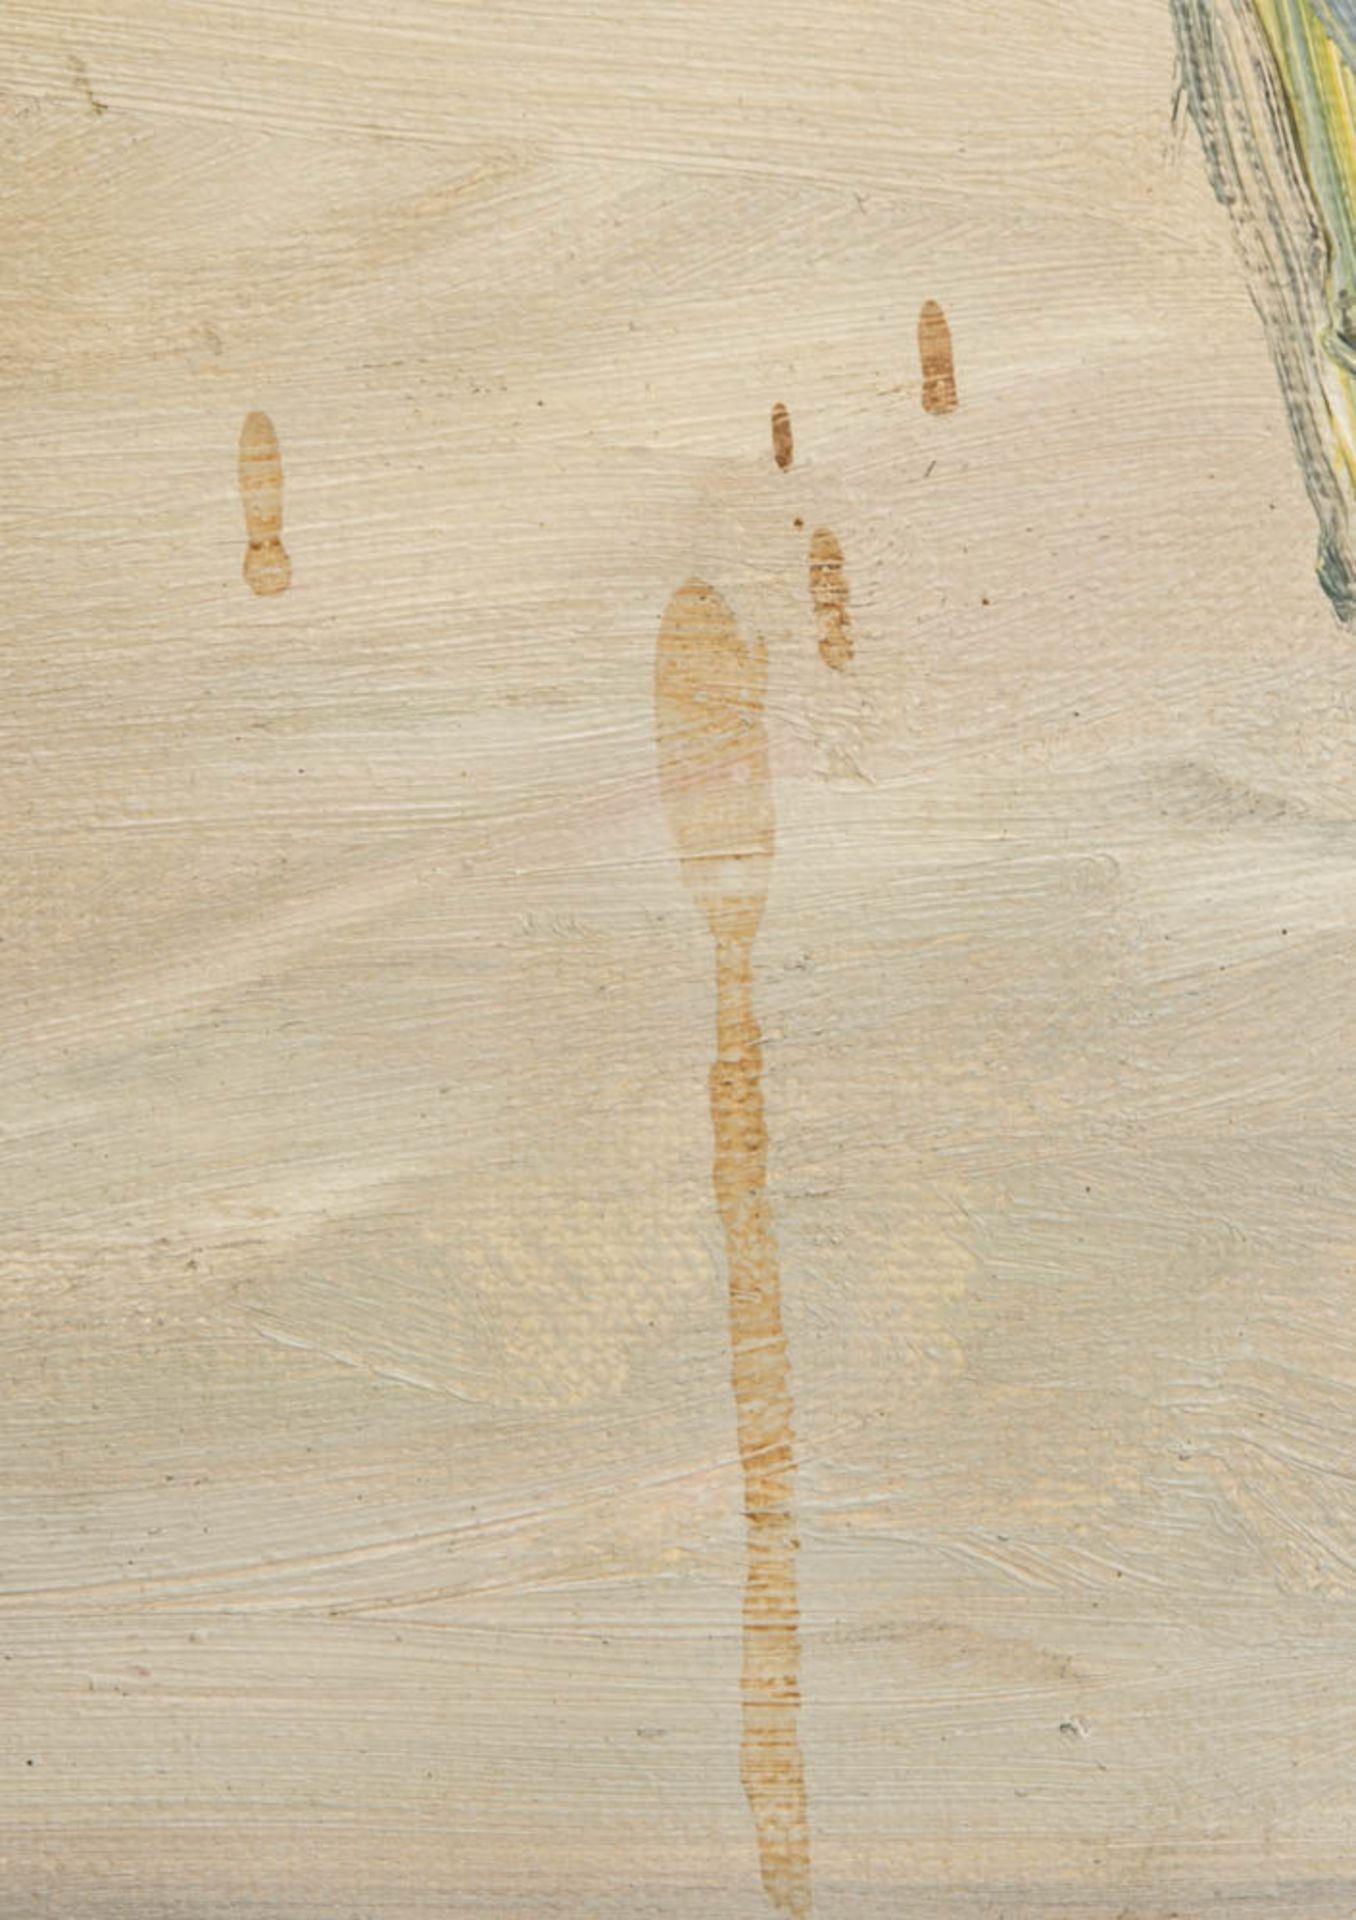 Paul Kapell, Segelboot, Öl auf Karton, 19./20. Jh.Landschaftsansicht, Segelboot im Wi - Bild 5 aus 6